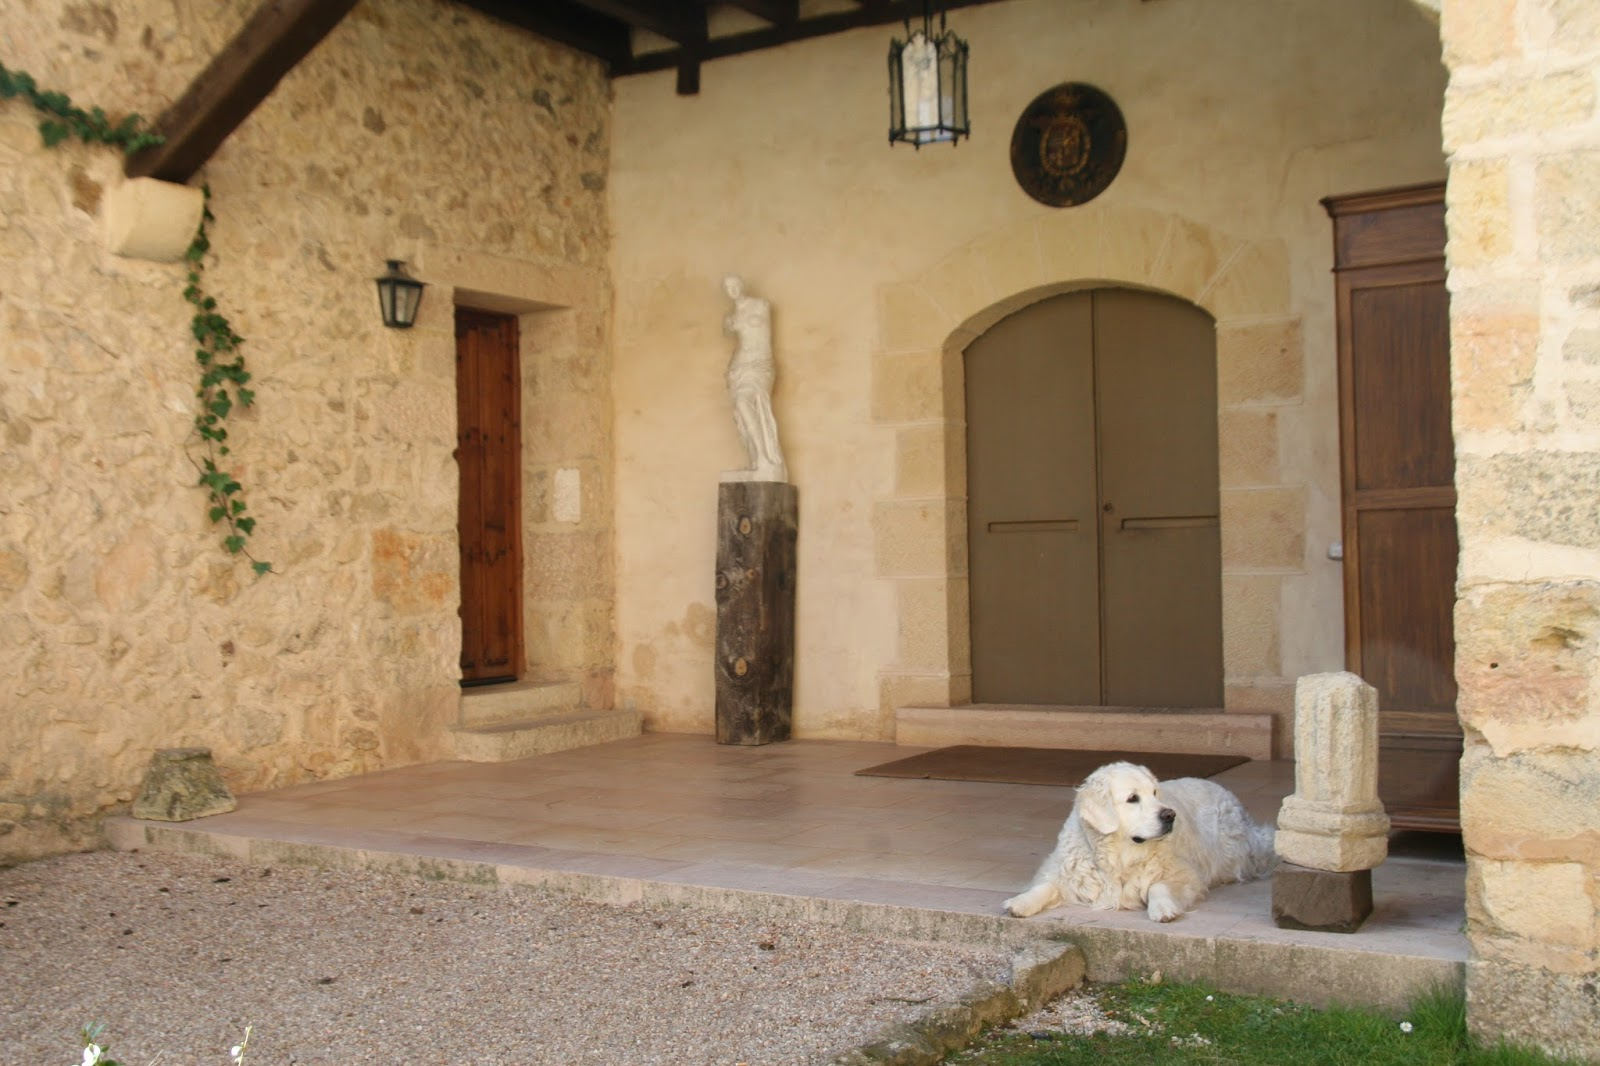 Pedraza segovia viajes con mi perro for Muebles rey segovia